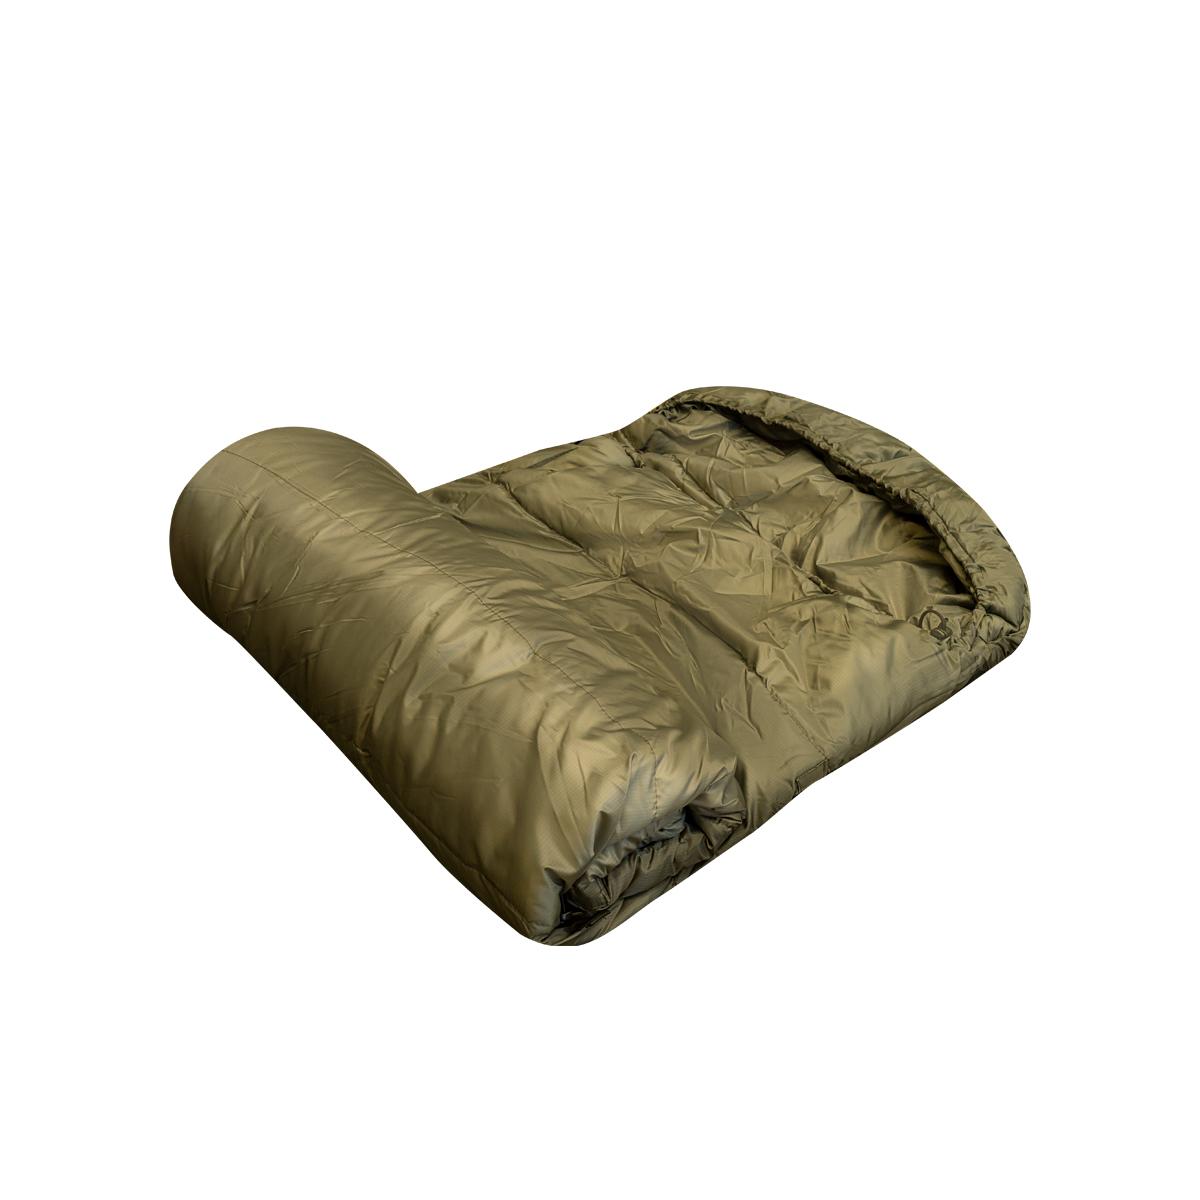 ARNO 4 ZONE SLEEPING BAG